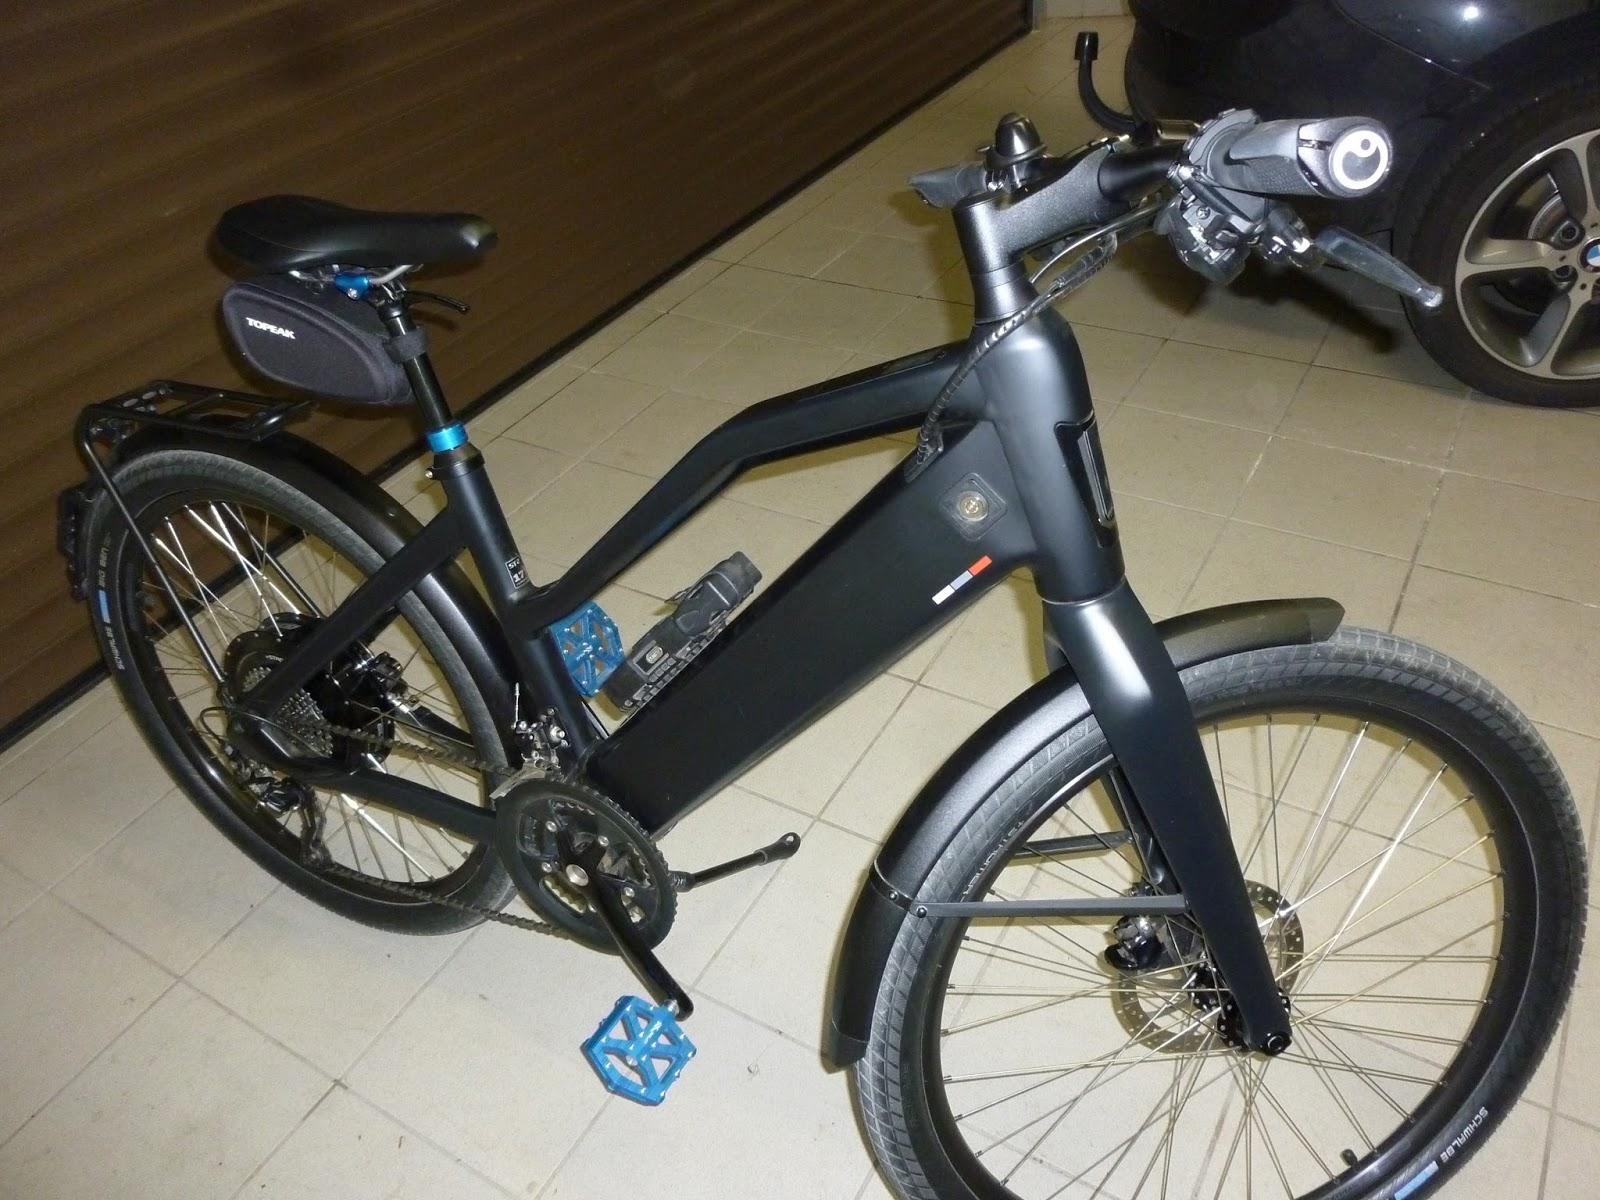 neuwertiger stromer st2 45 km h zu verkaufen eblog by e bike company mainz. Black Bedroom Furniture Sets. Home Design Ideas